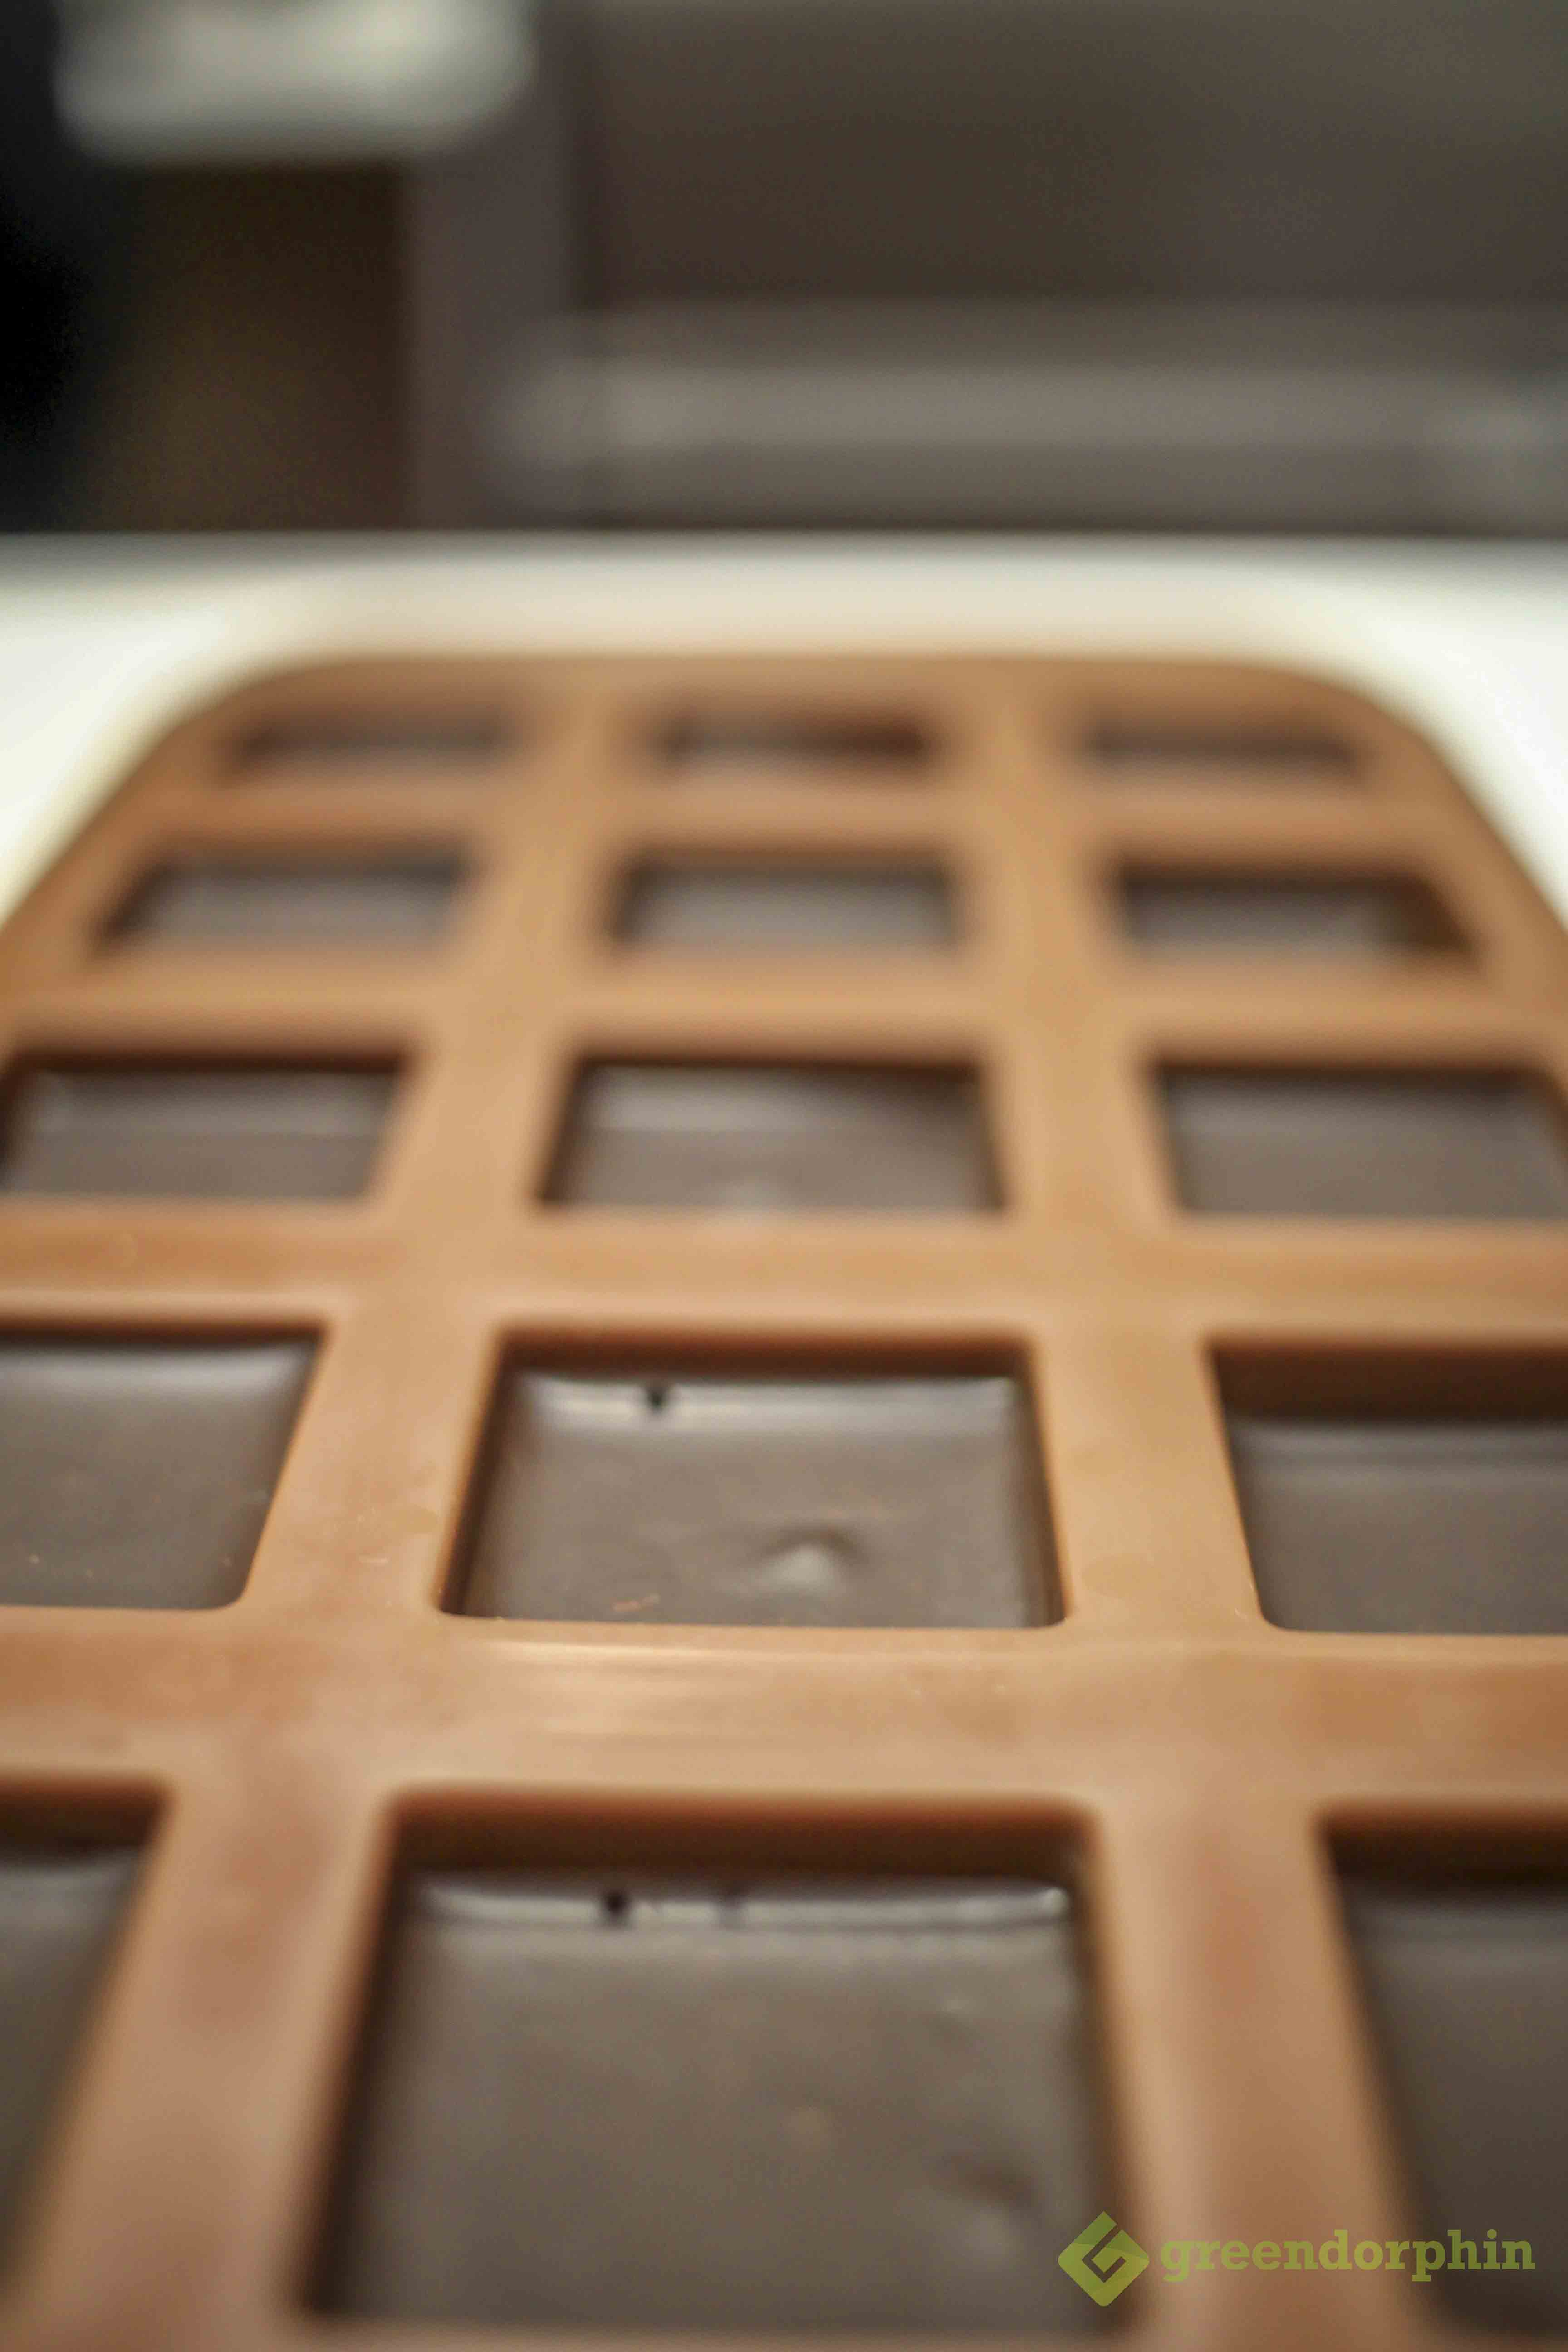 Cannabis Chocolate bars in mould is better than smoking marijuana